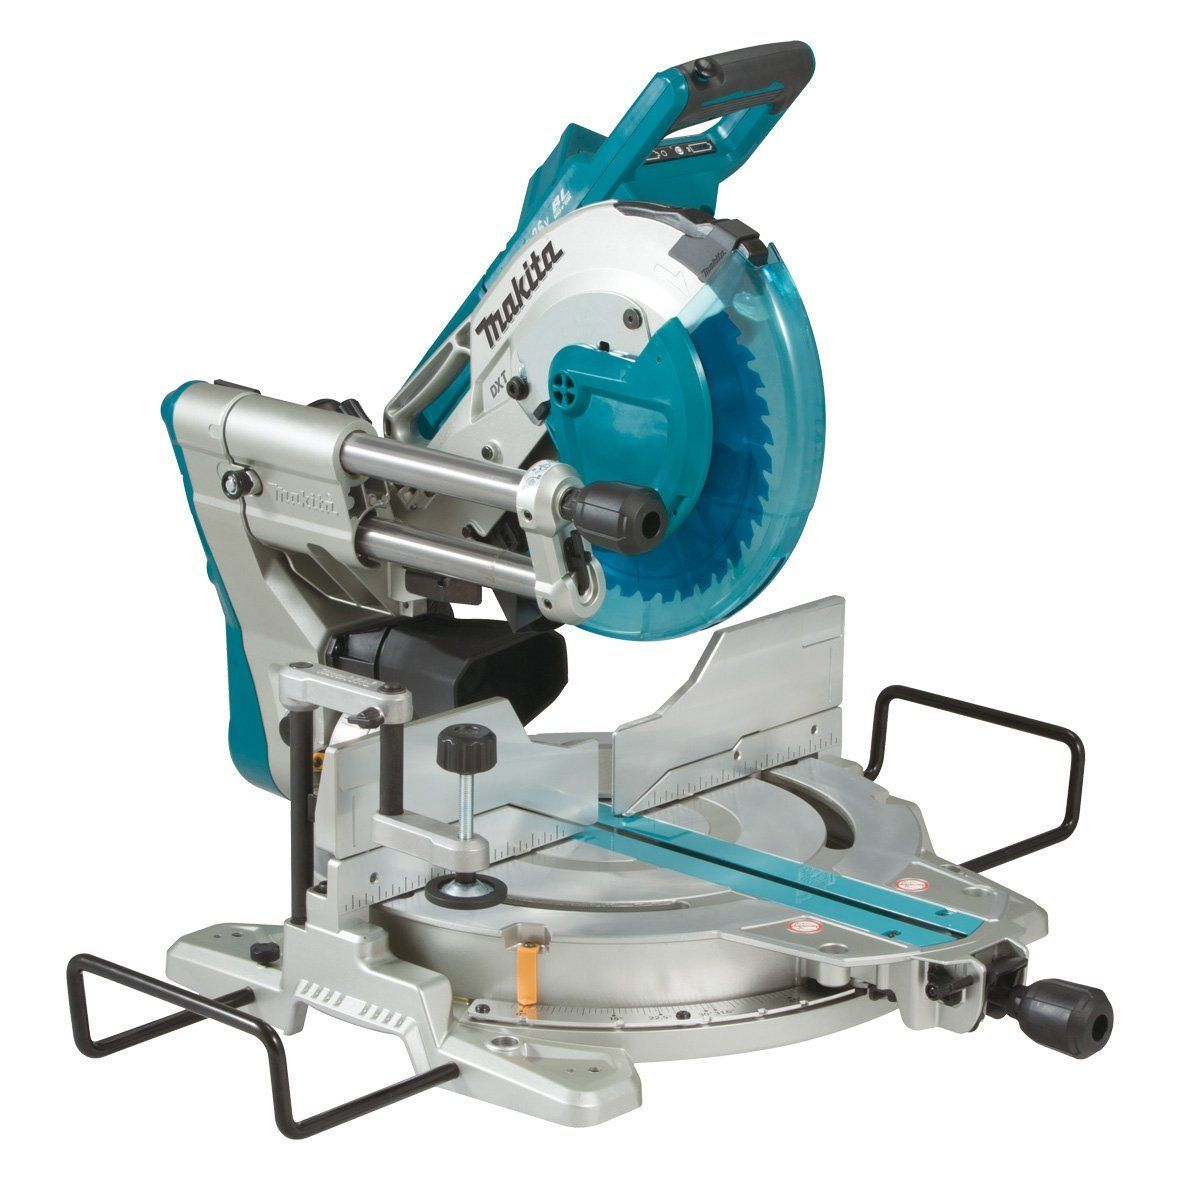 Swanky Second Hand Power Tools Toolstoliveby Constructionhandtools Sliding Compound Miter Saw Compound Mitre Saw Sliding Mitre Saw